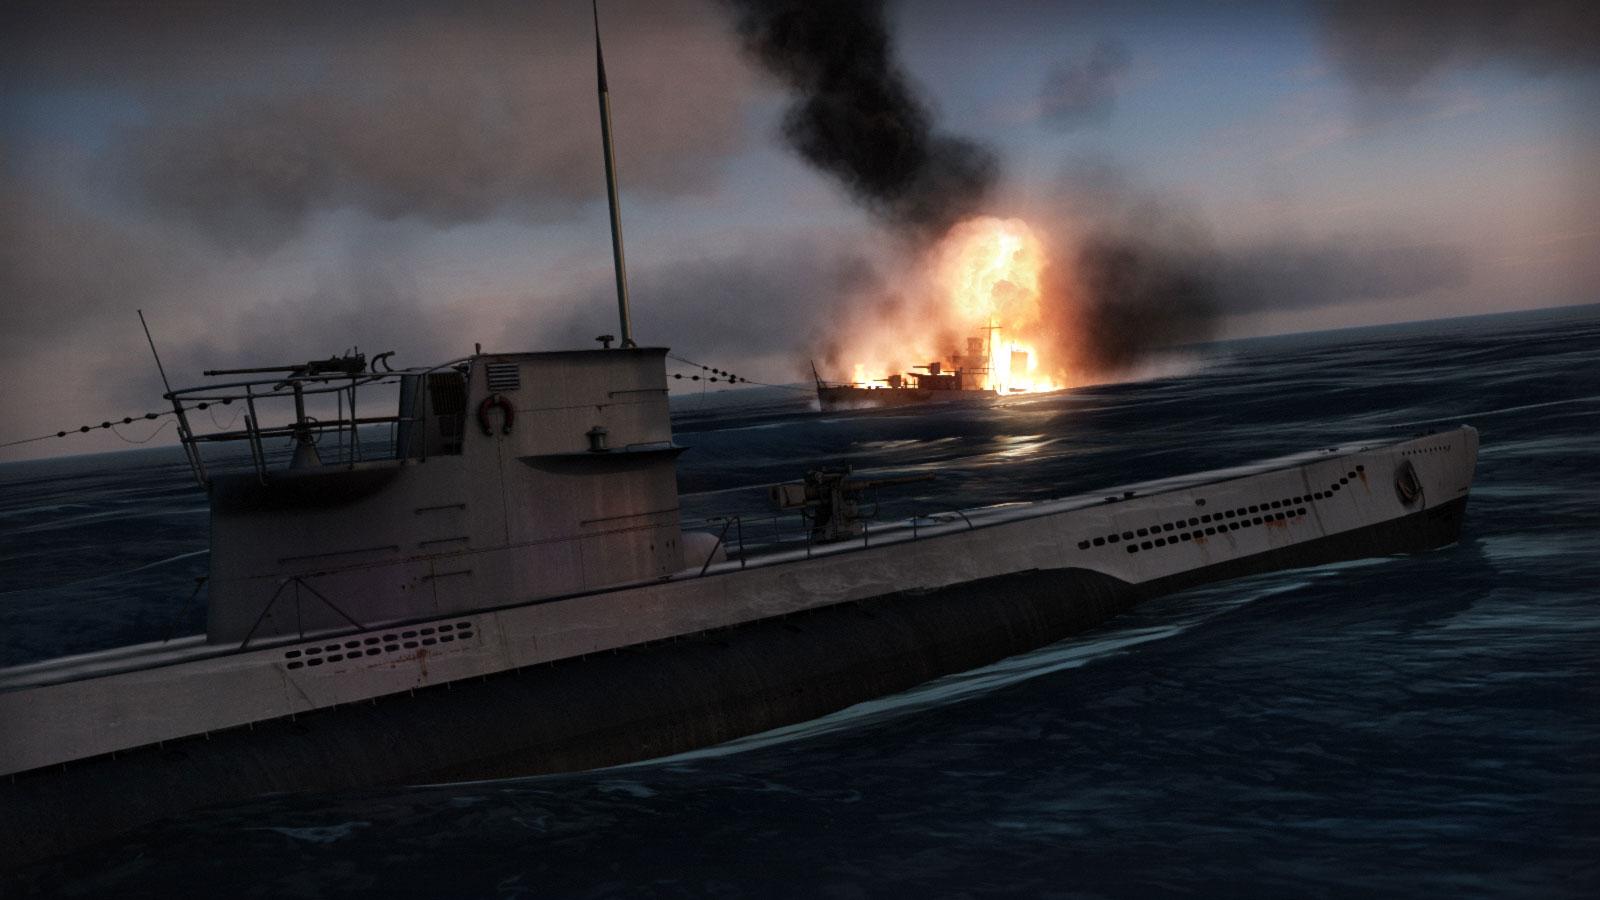 Скриншот игры Silent Hunter 5. Битва за Атлантику. Классика жанра .